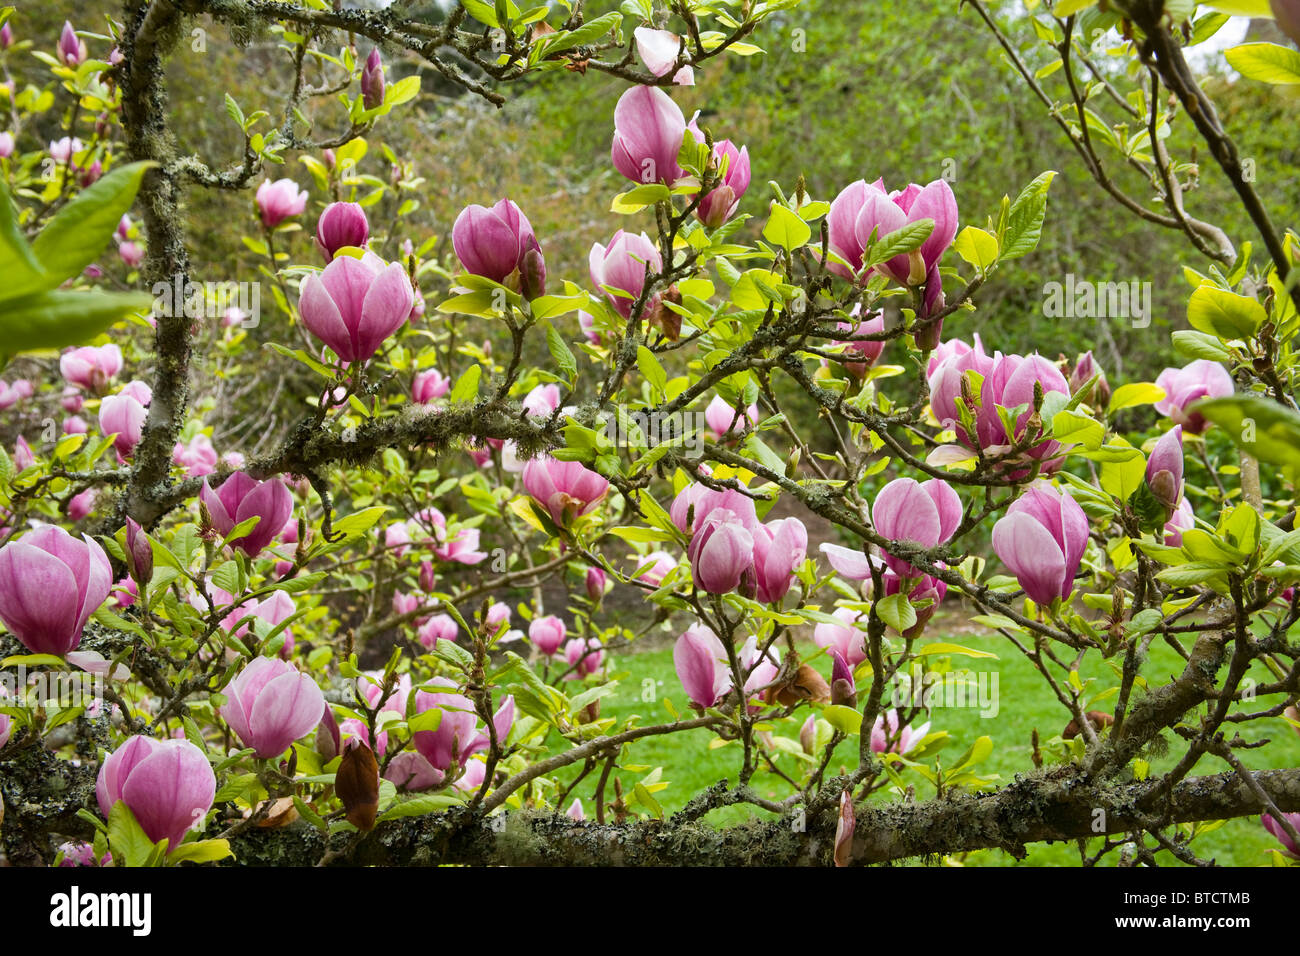 Magnolia x soulangeana Tree Trelissick Garden United Kingdom Stock Photo